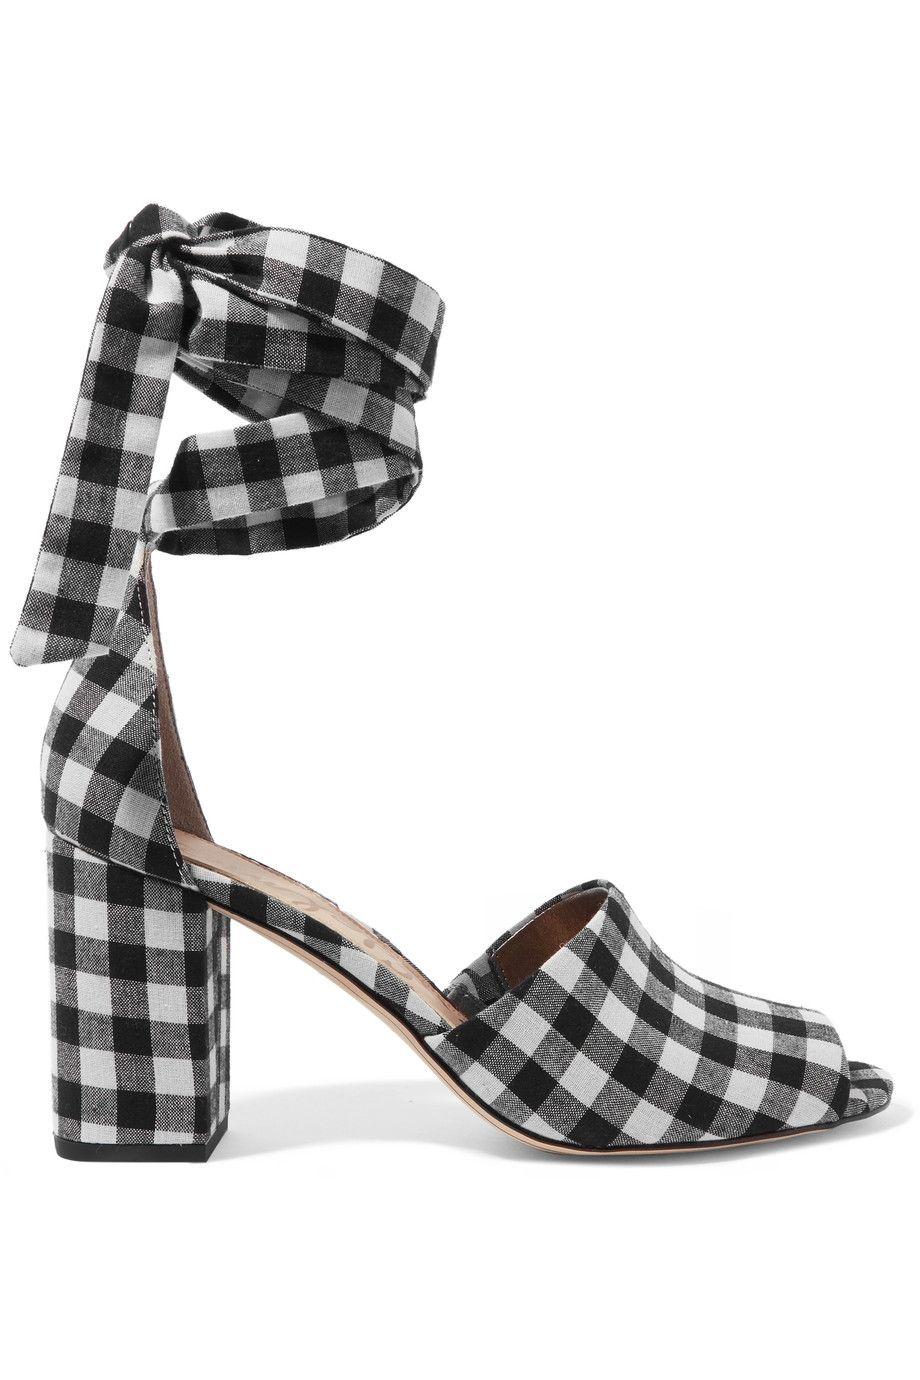 8b43539ec3f SAM EDELMAN Odele gingham canvas sandals